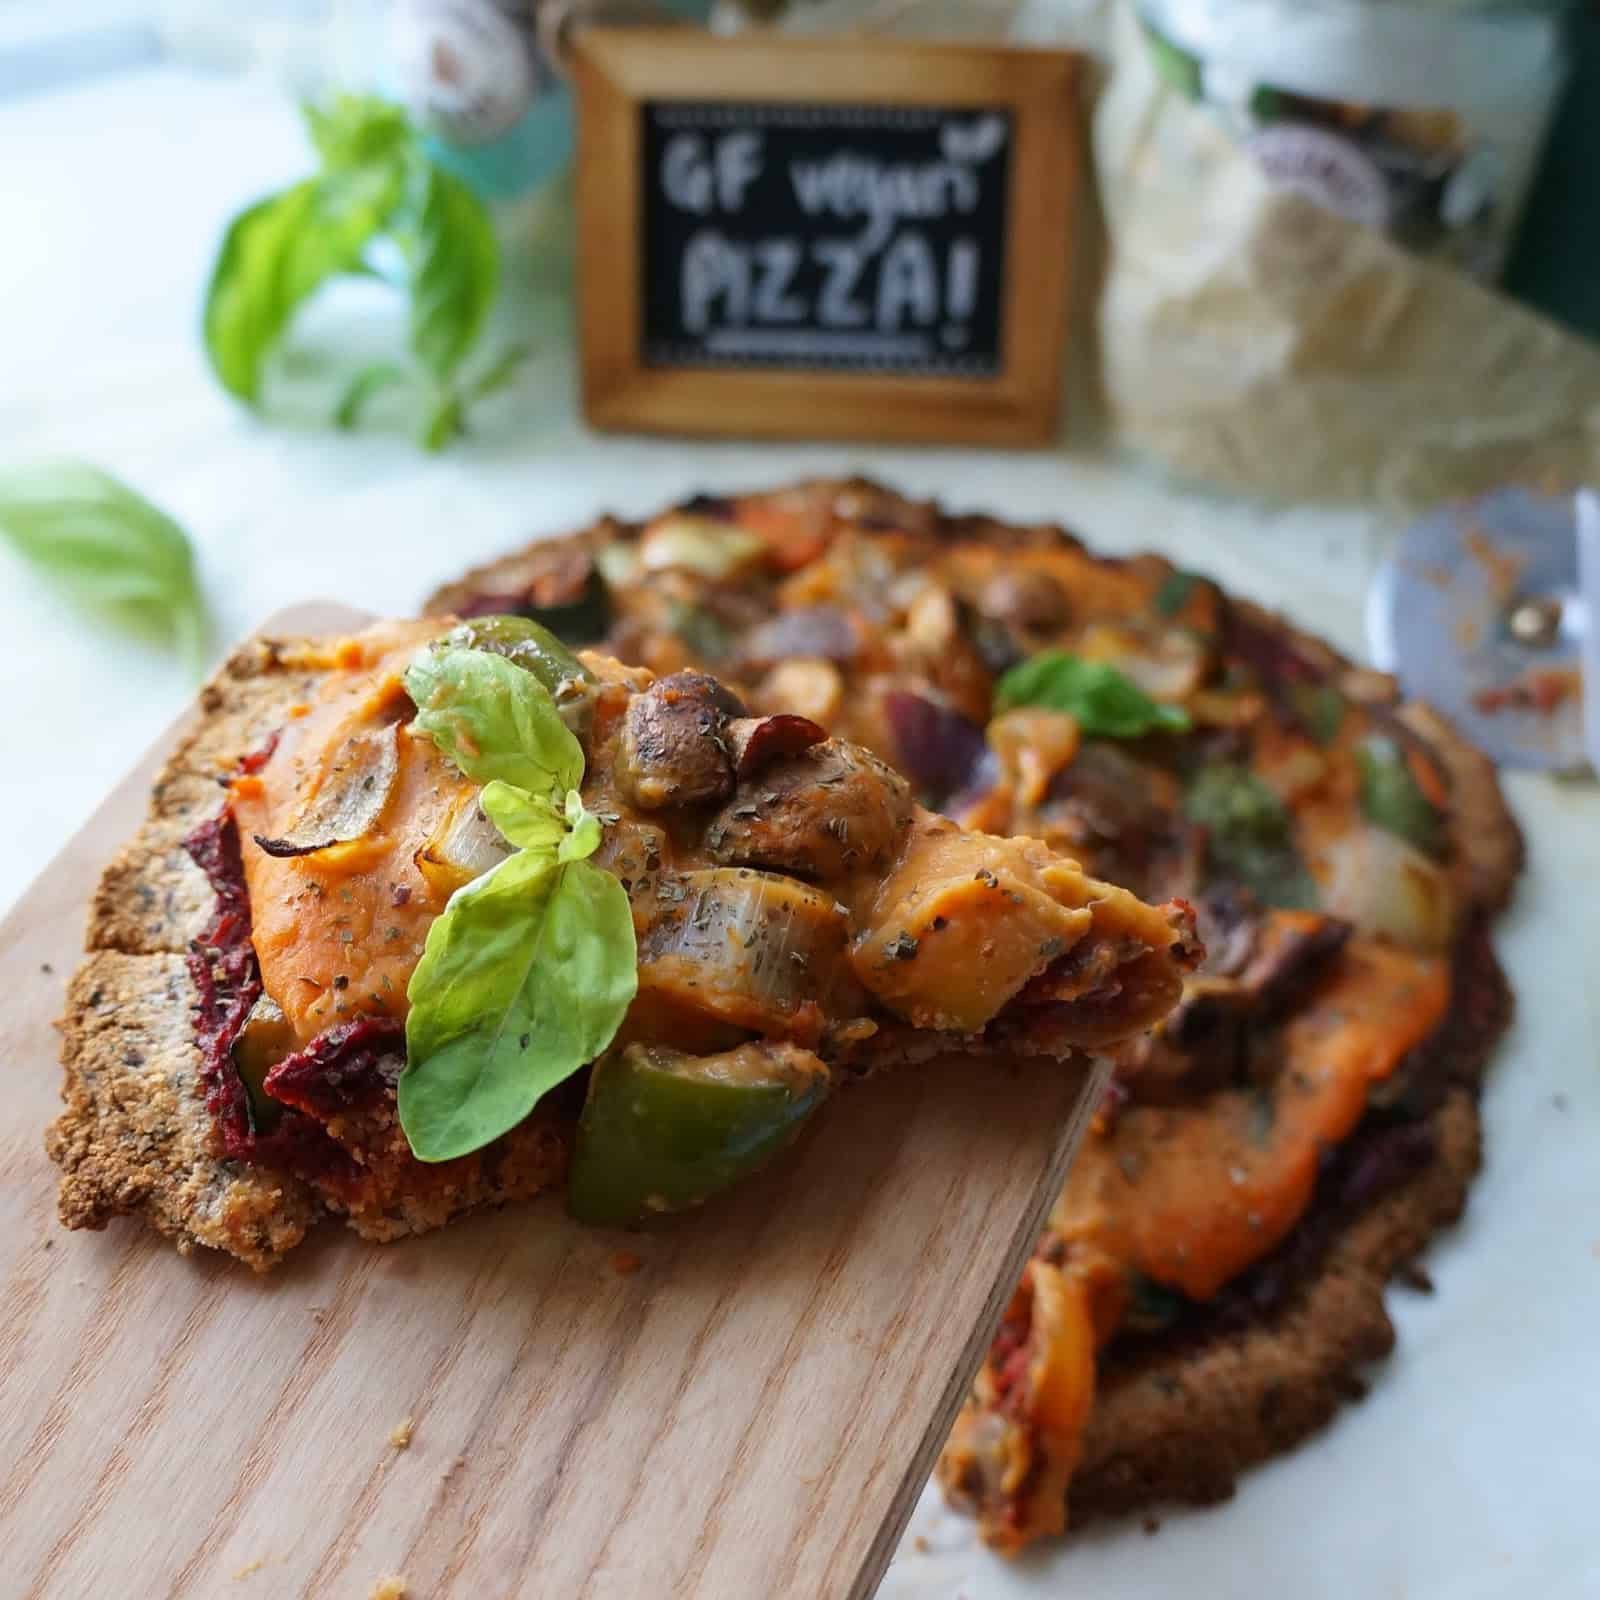 Coconut Flour Crust Pizza